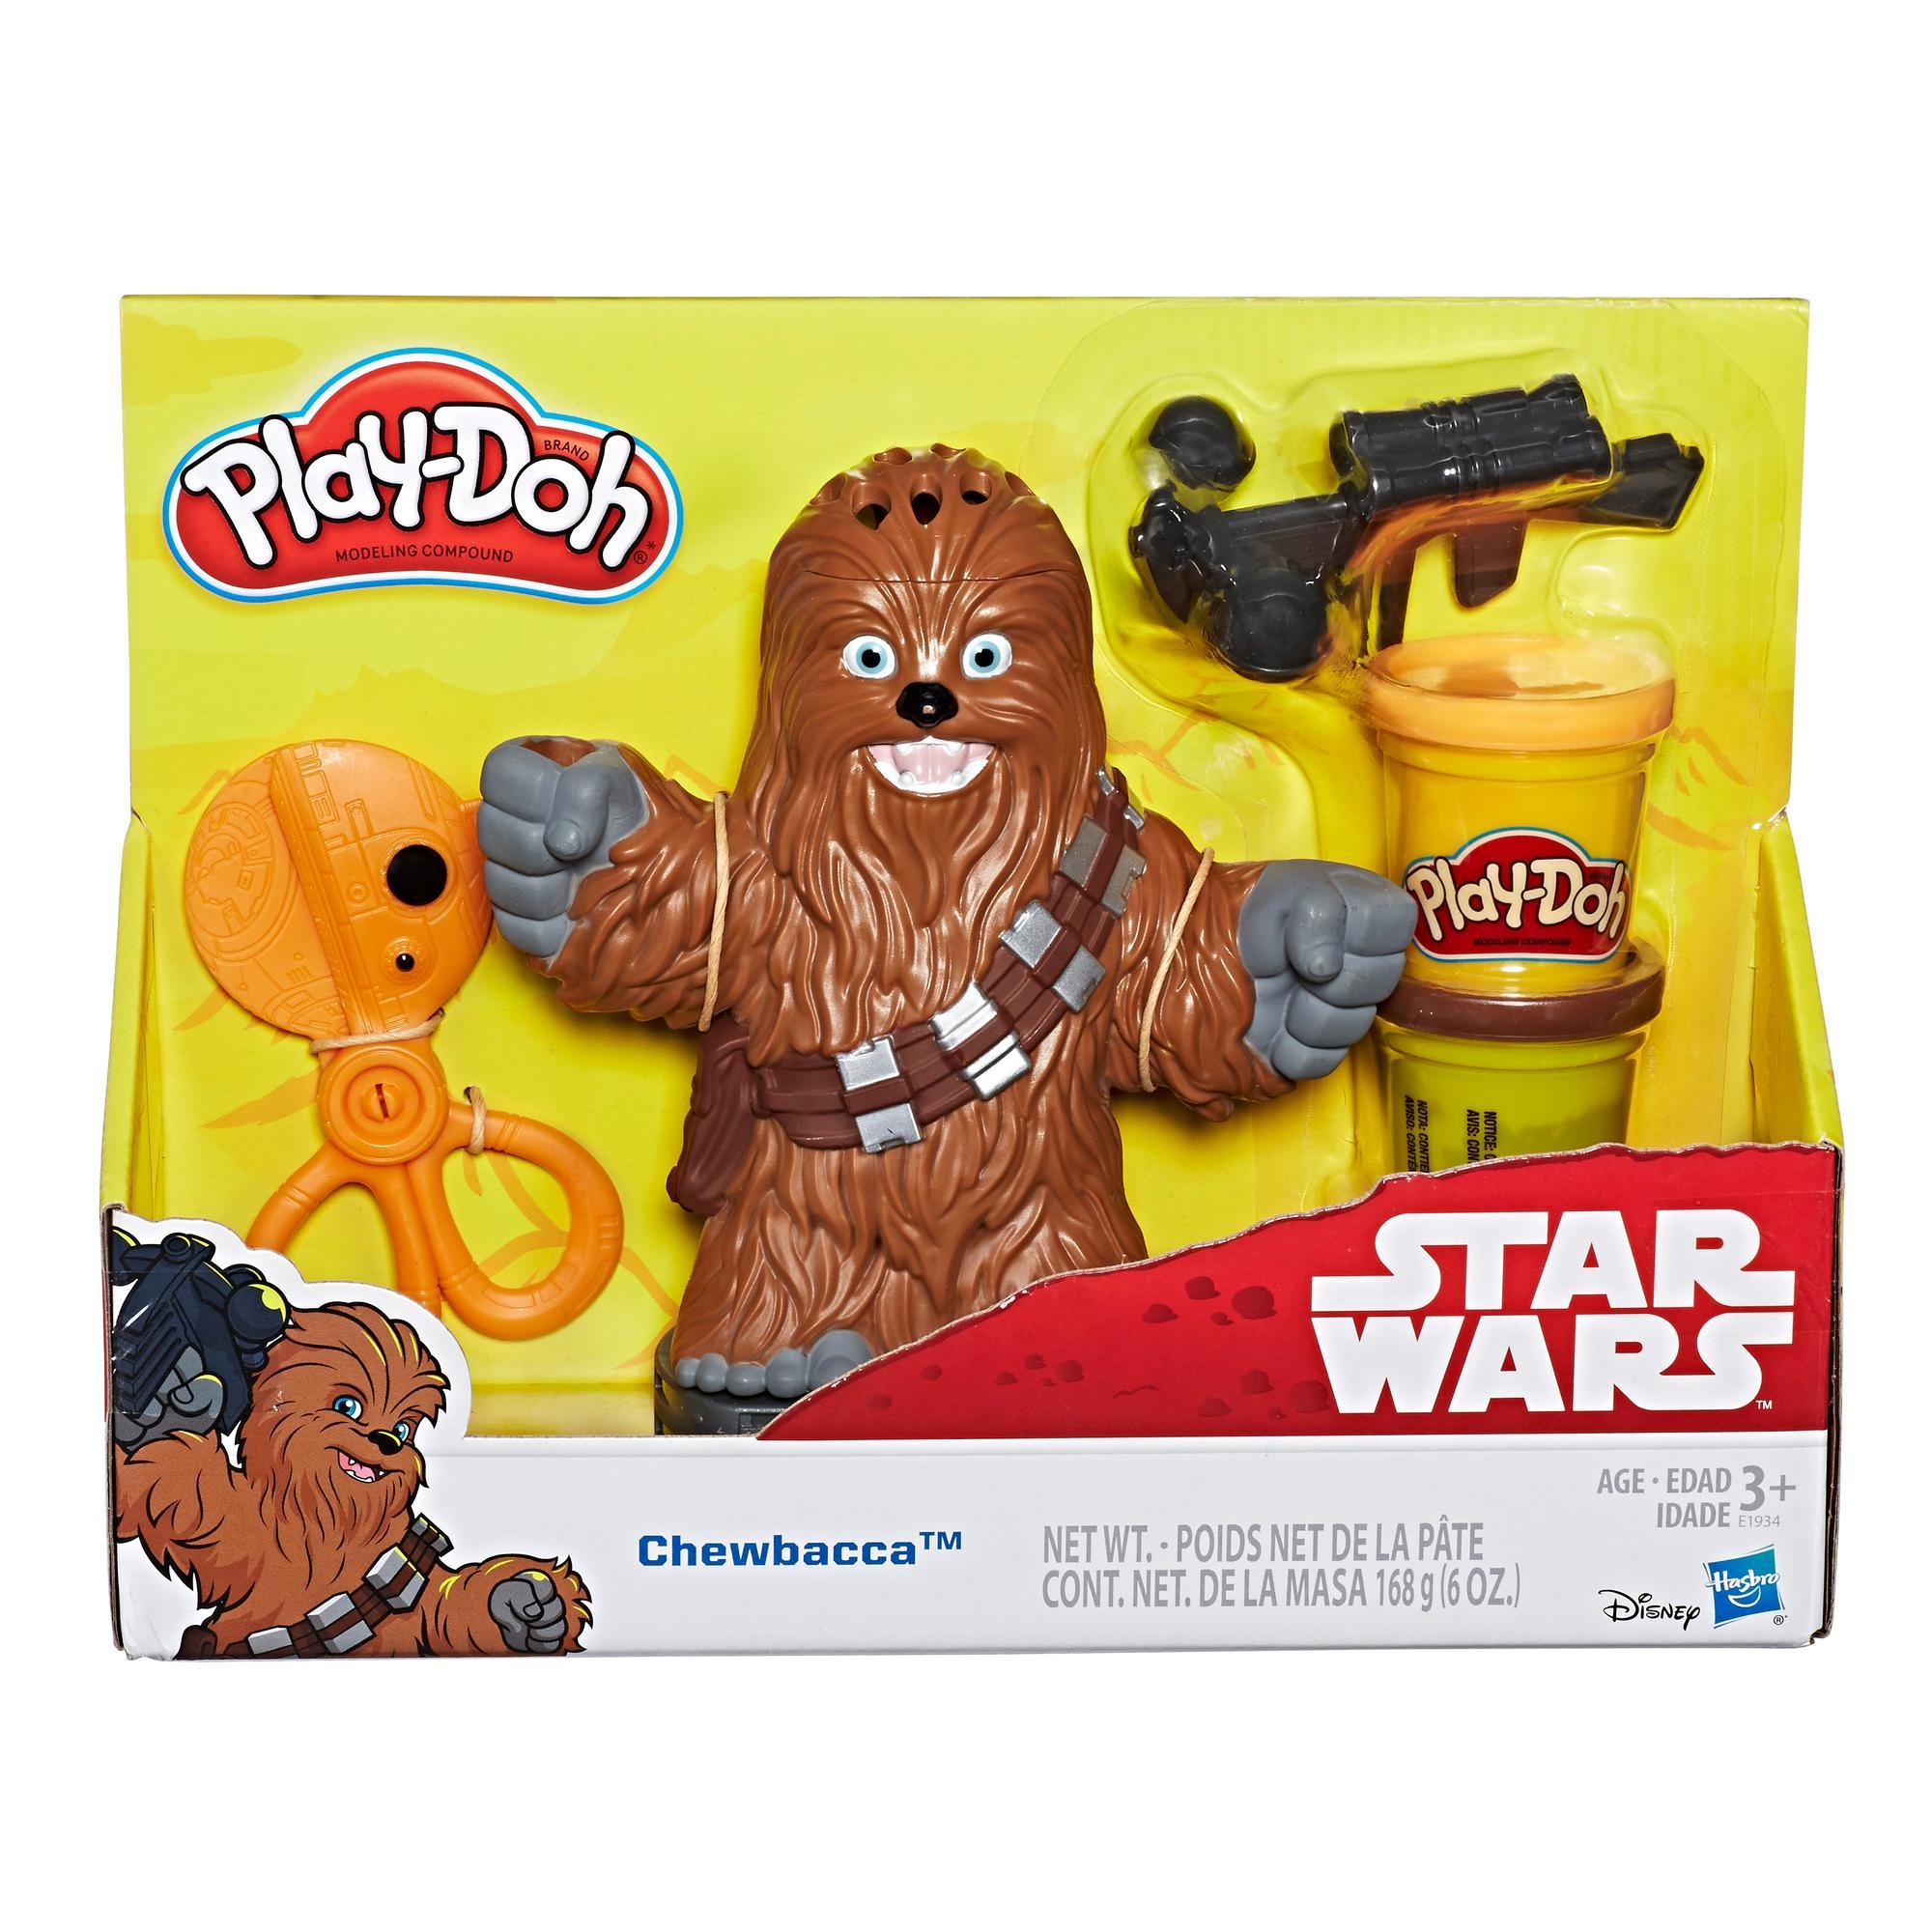 Play-Doh Star Wars - Chewbacca